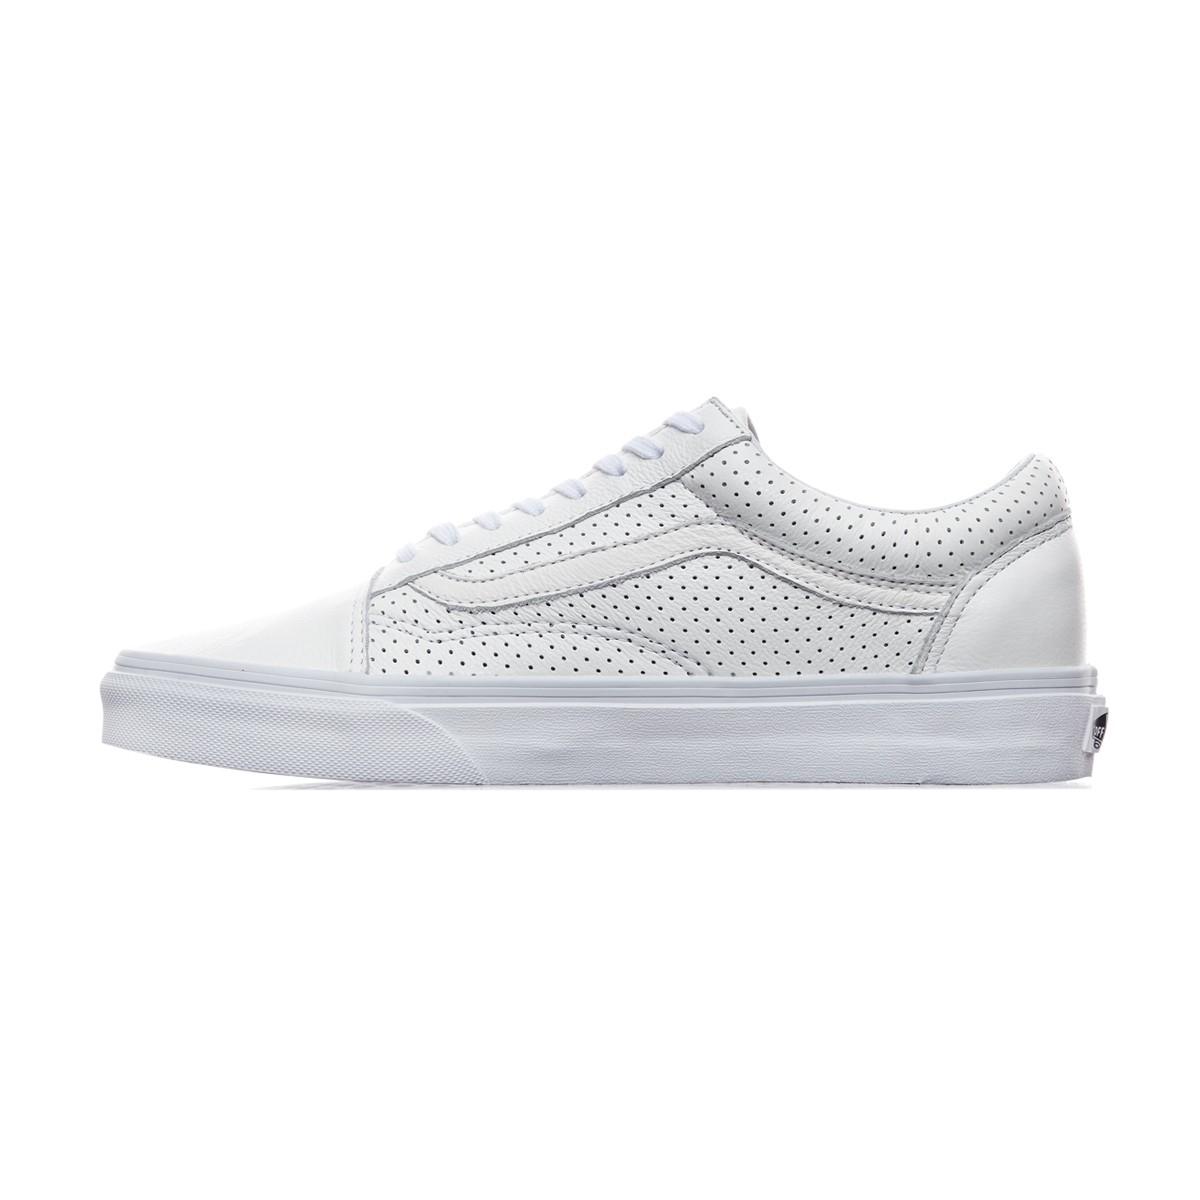 30b006355c8 Vans Old Skool Zip Perforated Leather Sneakers in White for Men - Lyst